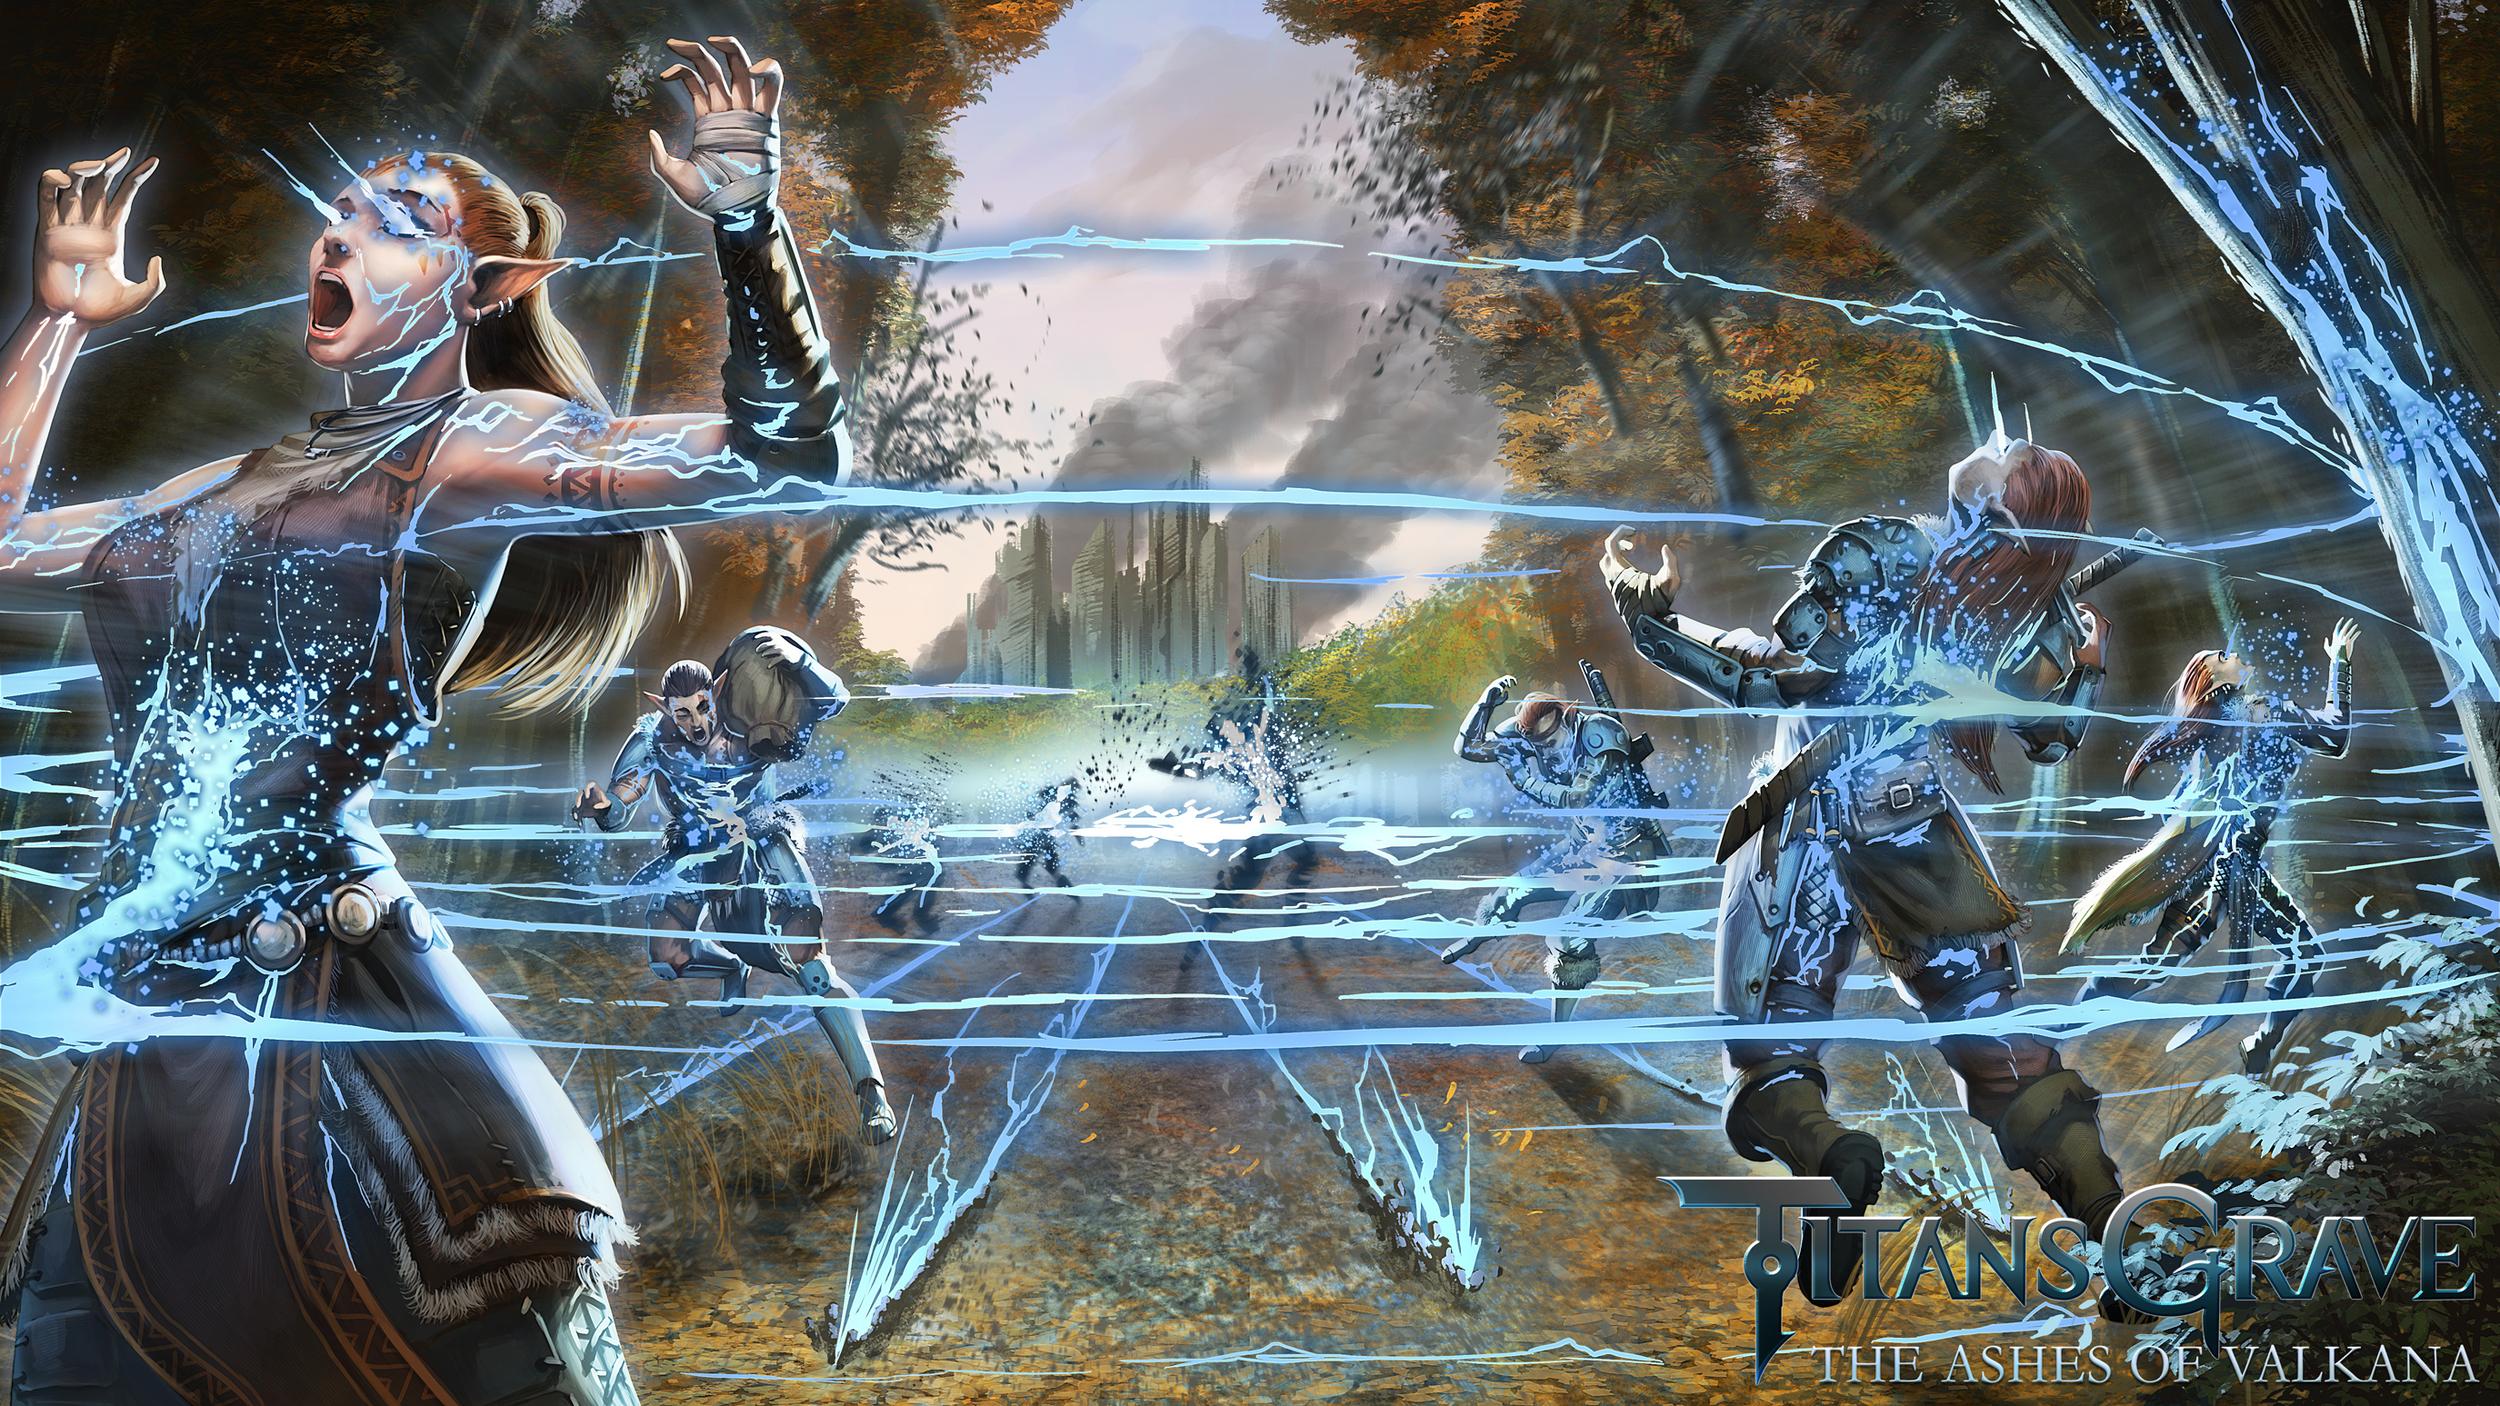 titans grave 2.jpg